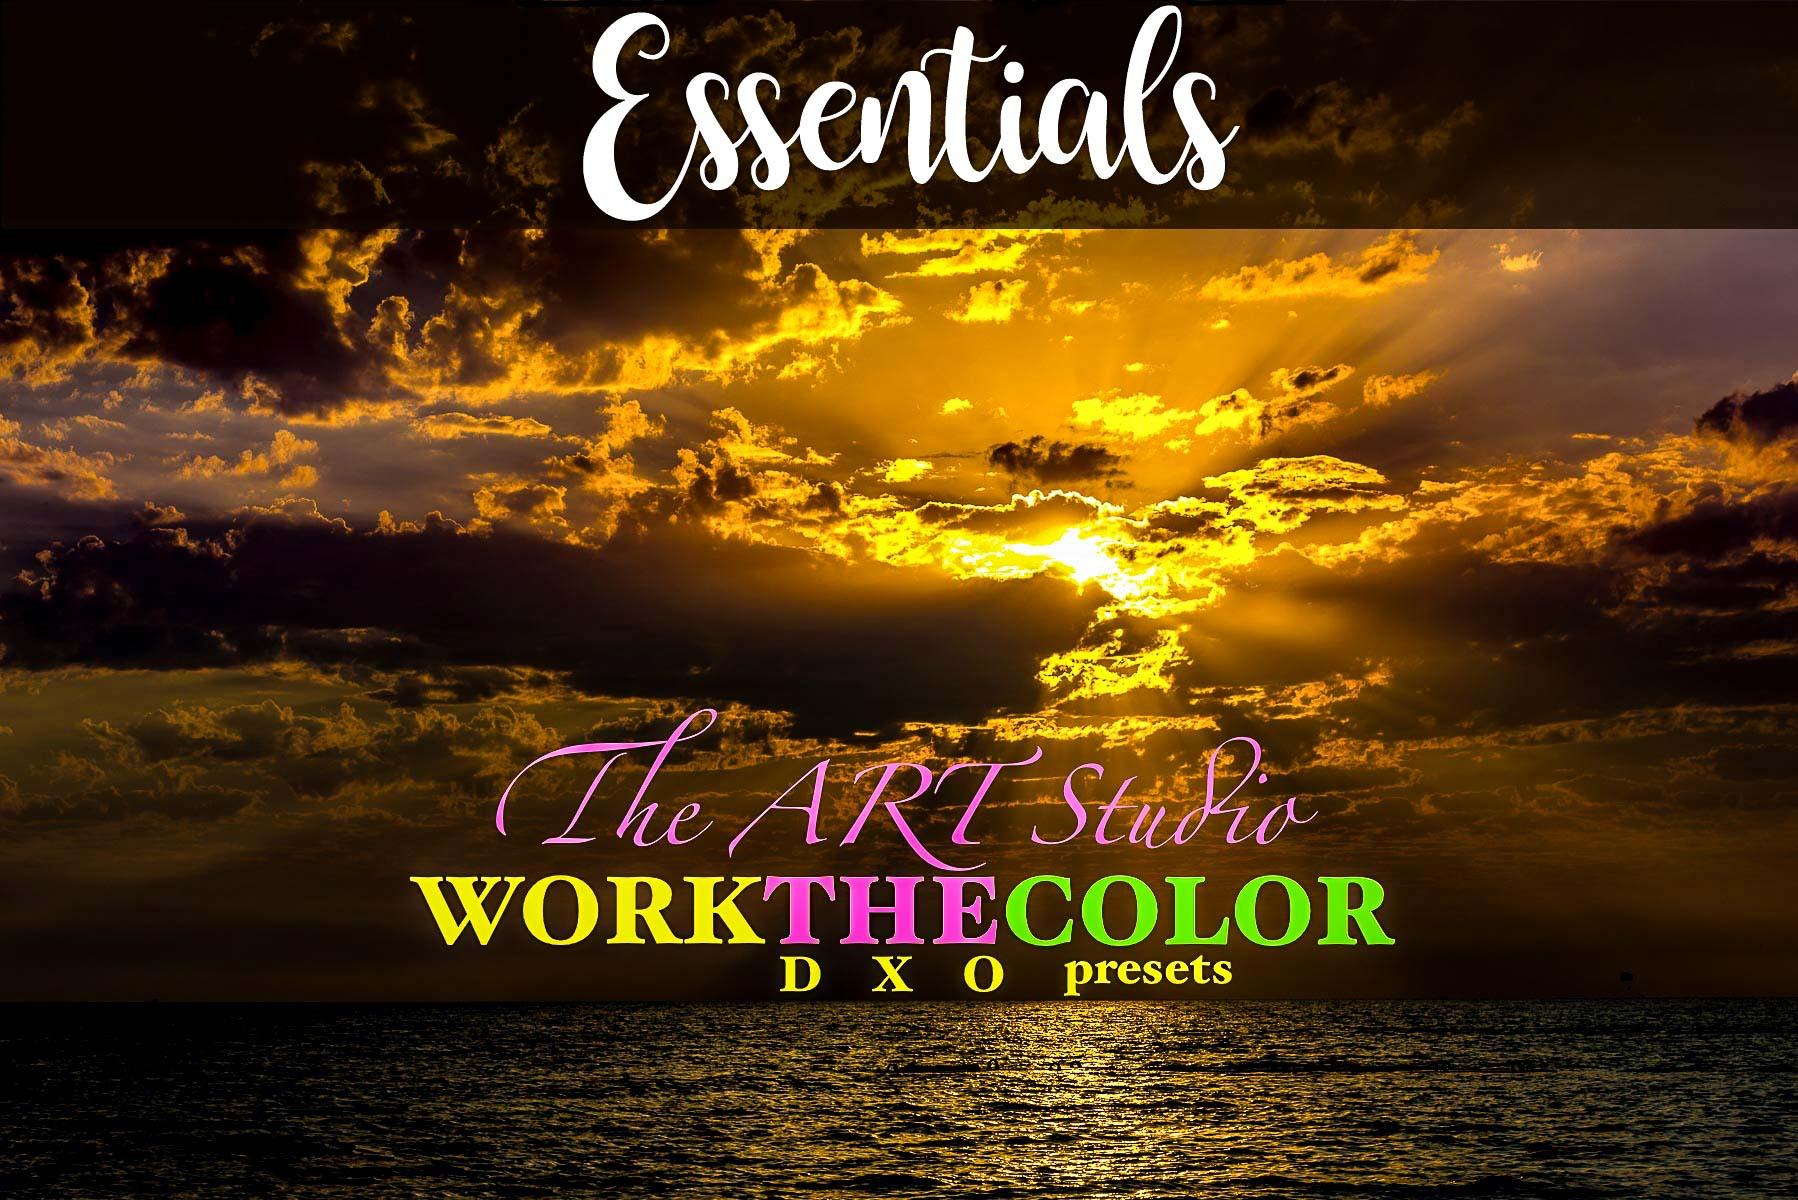 WORKtheCOLOR collection - essential DxO presets from PixaFOTO